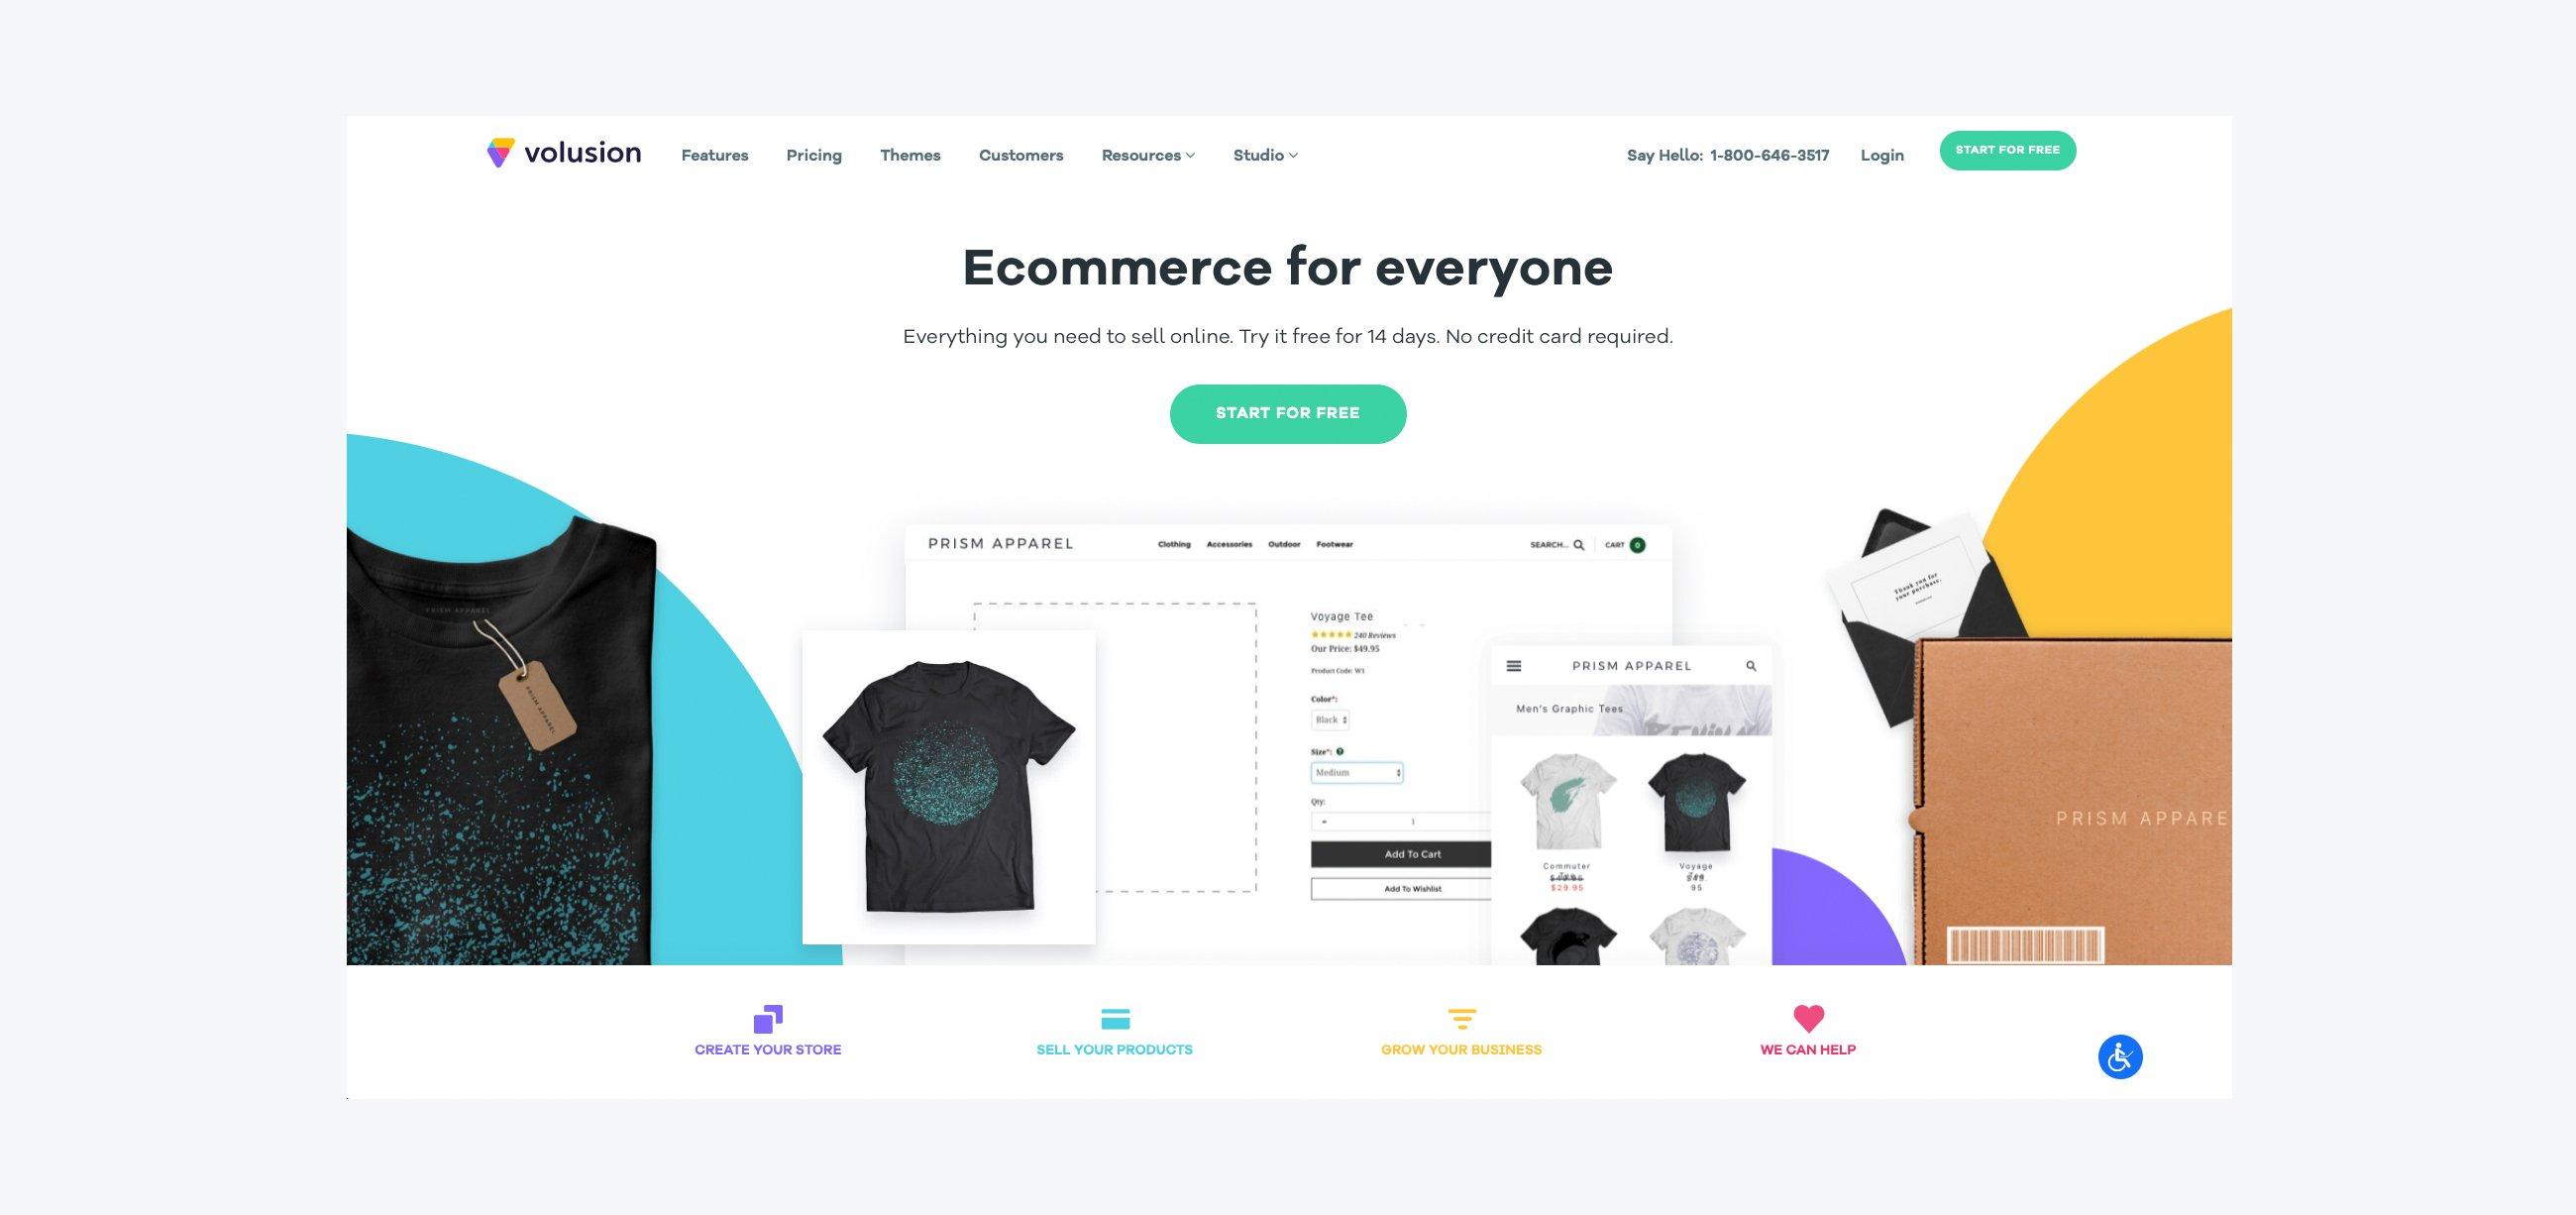 Top 10 eCommerce Platforms - Volusion